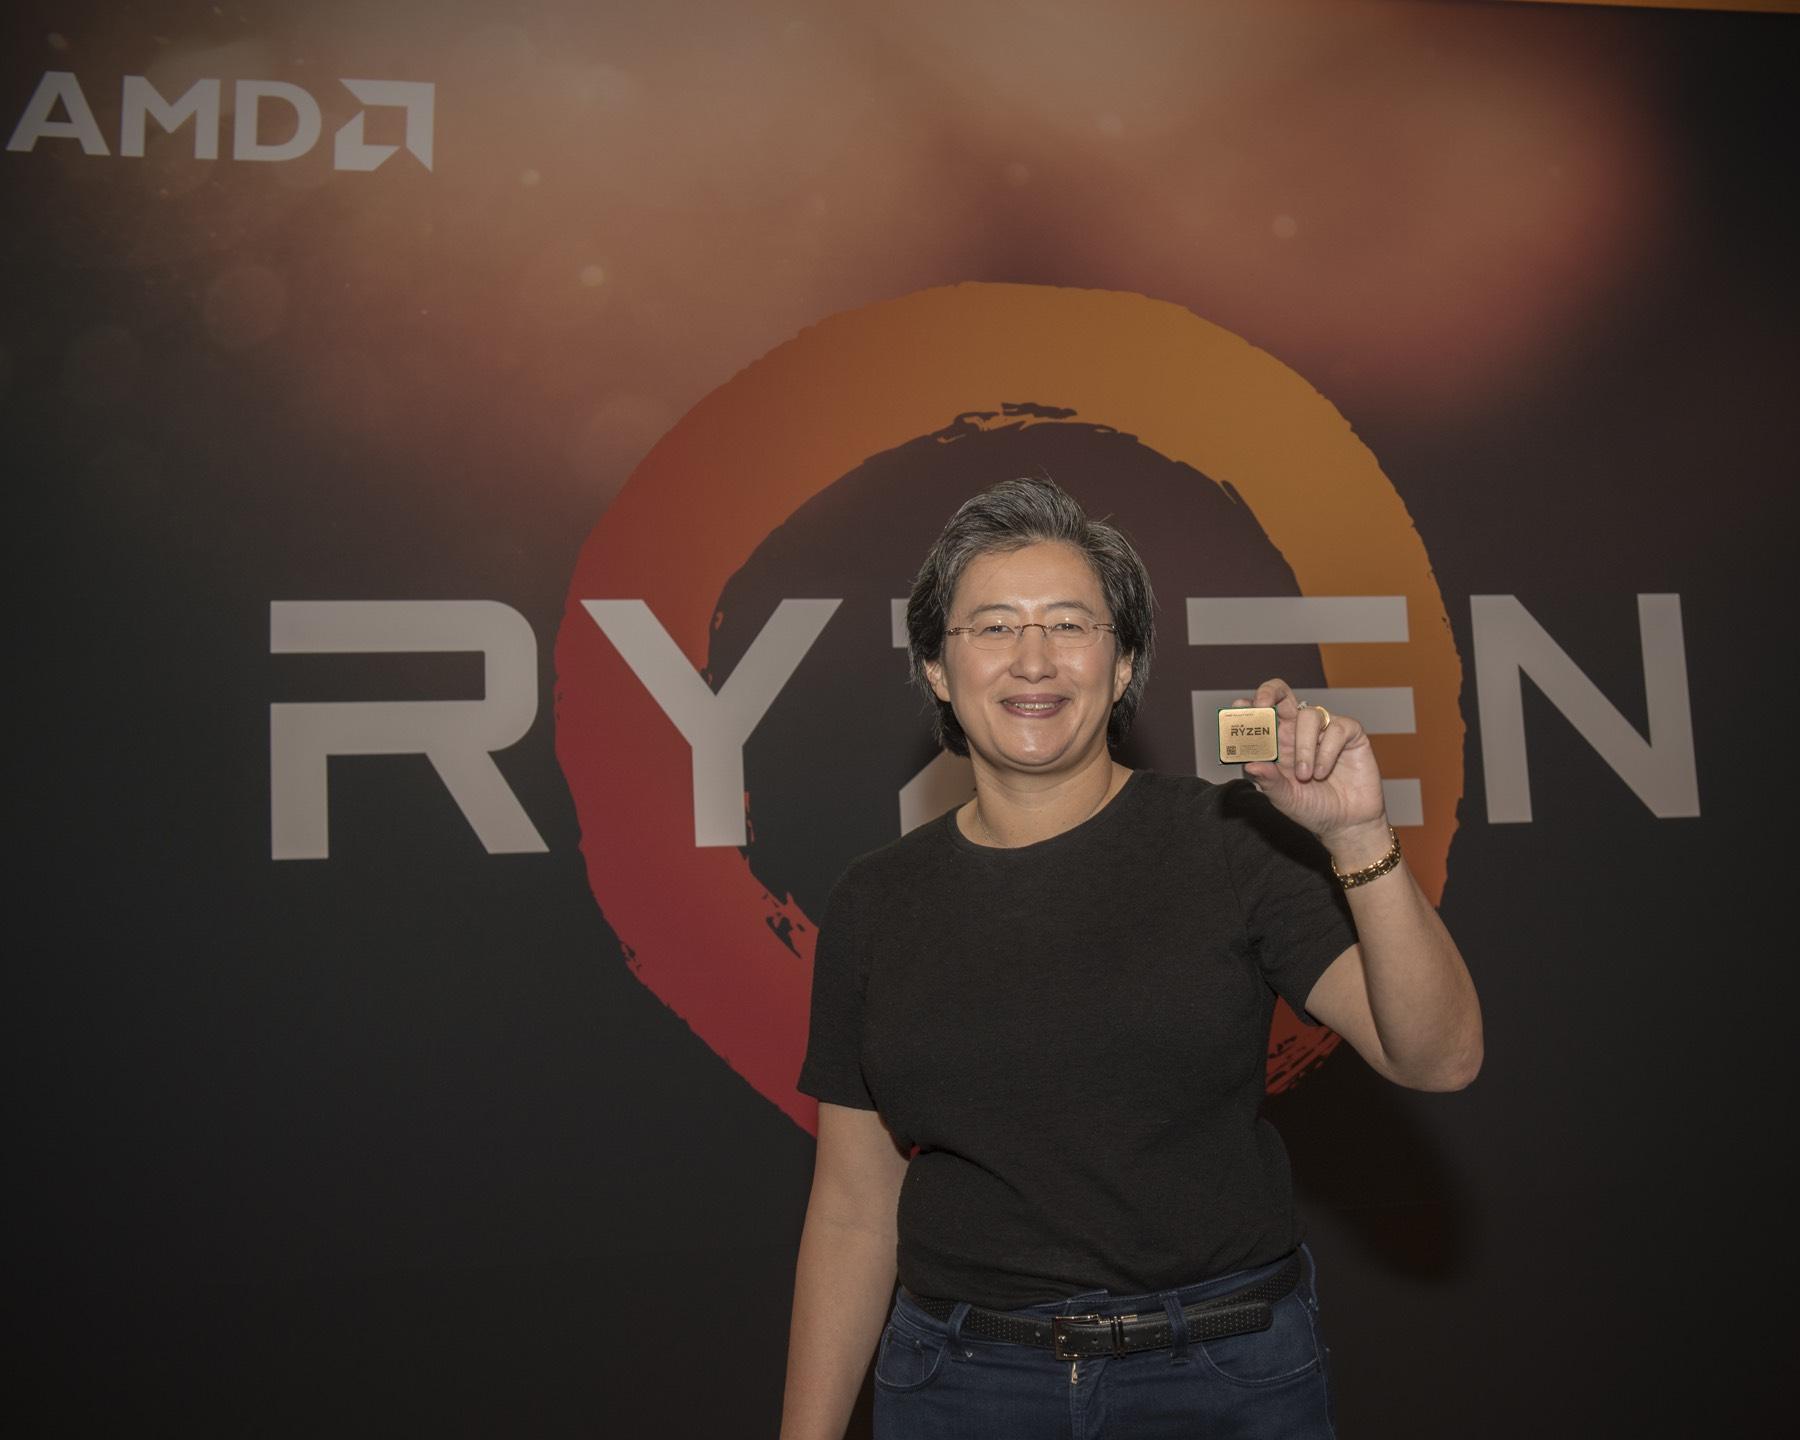 AMD CEO Lisa Su holding a Ryzen chip.